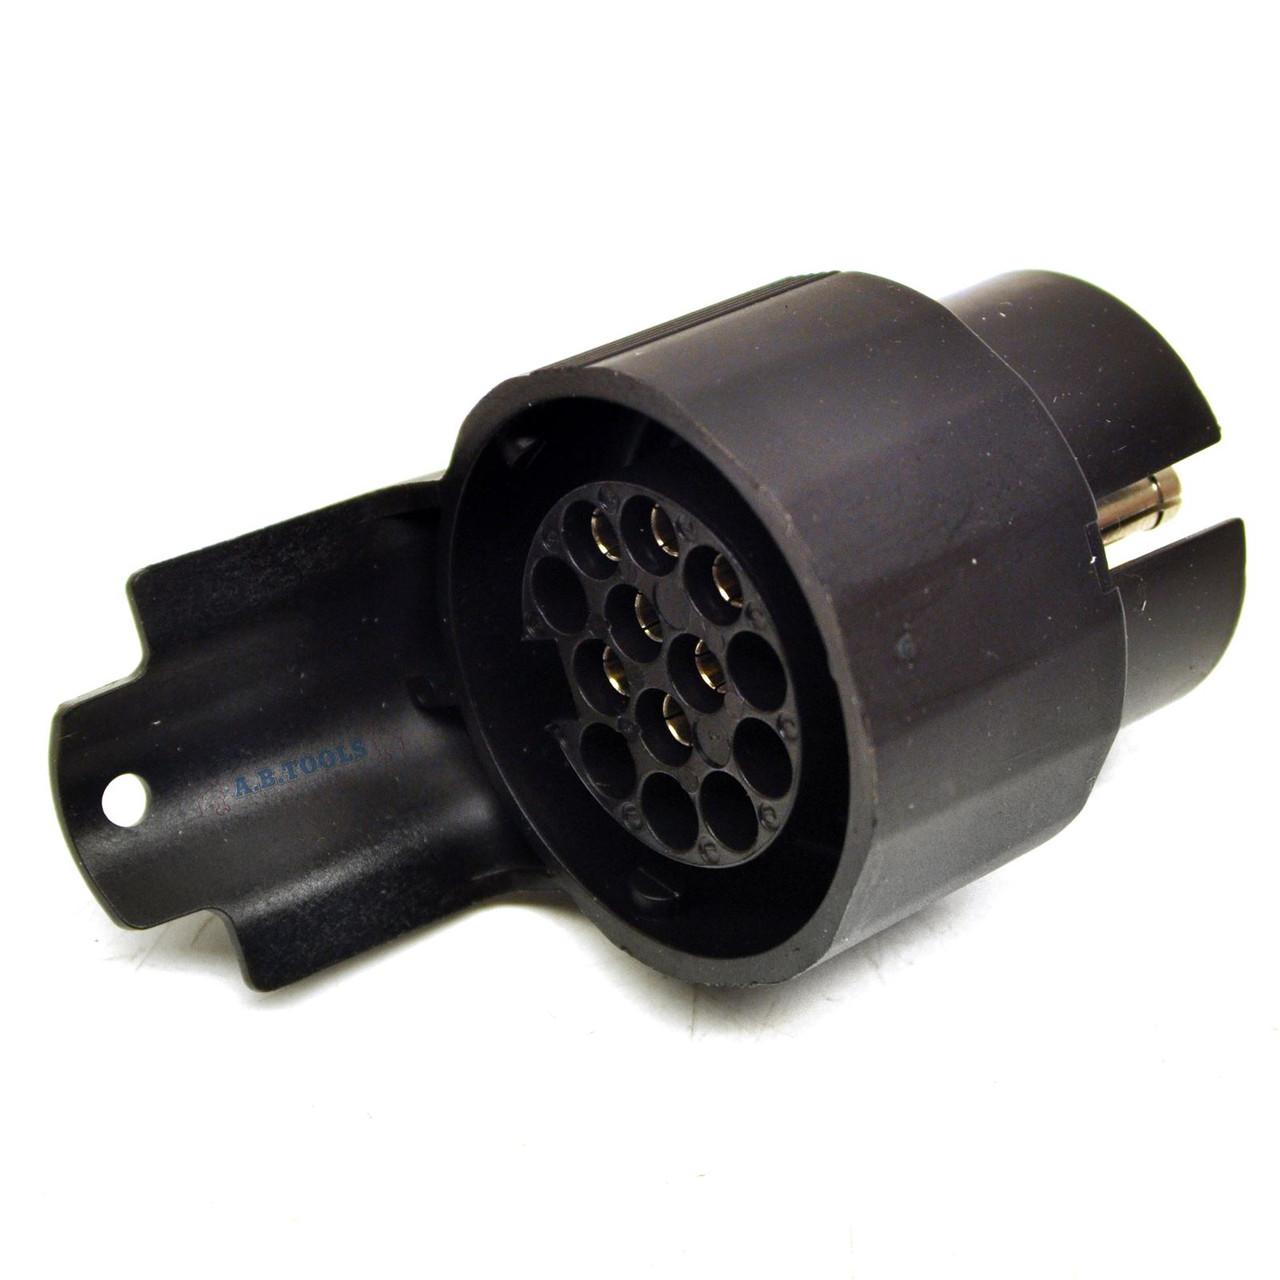 13 Pin Trailer Plug to 7 Pin Car Socket Wiring Adapter TR139